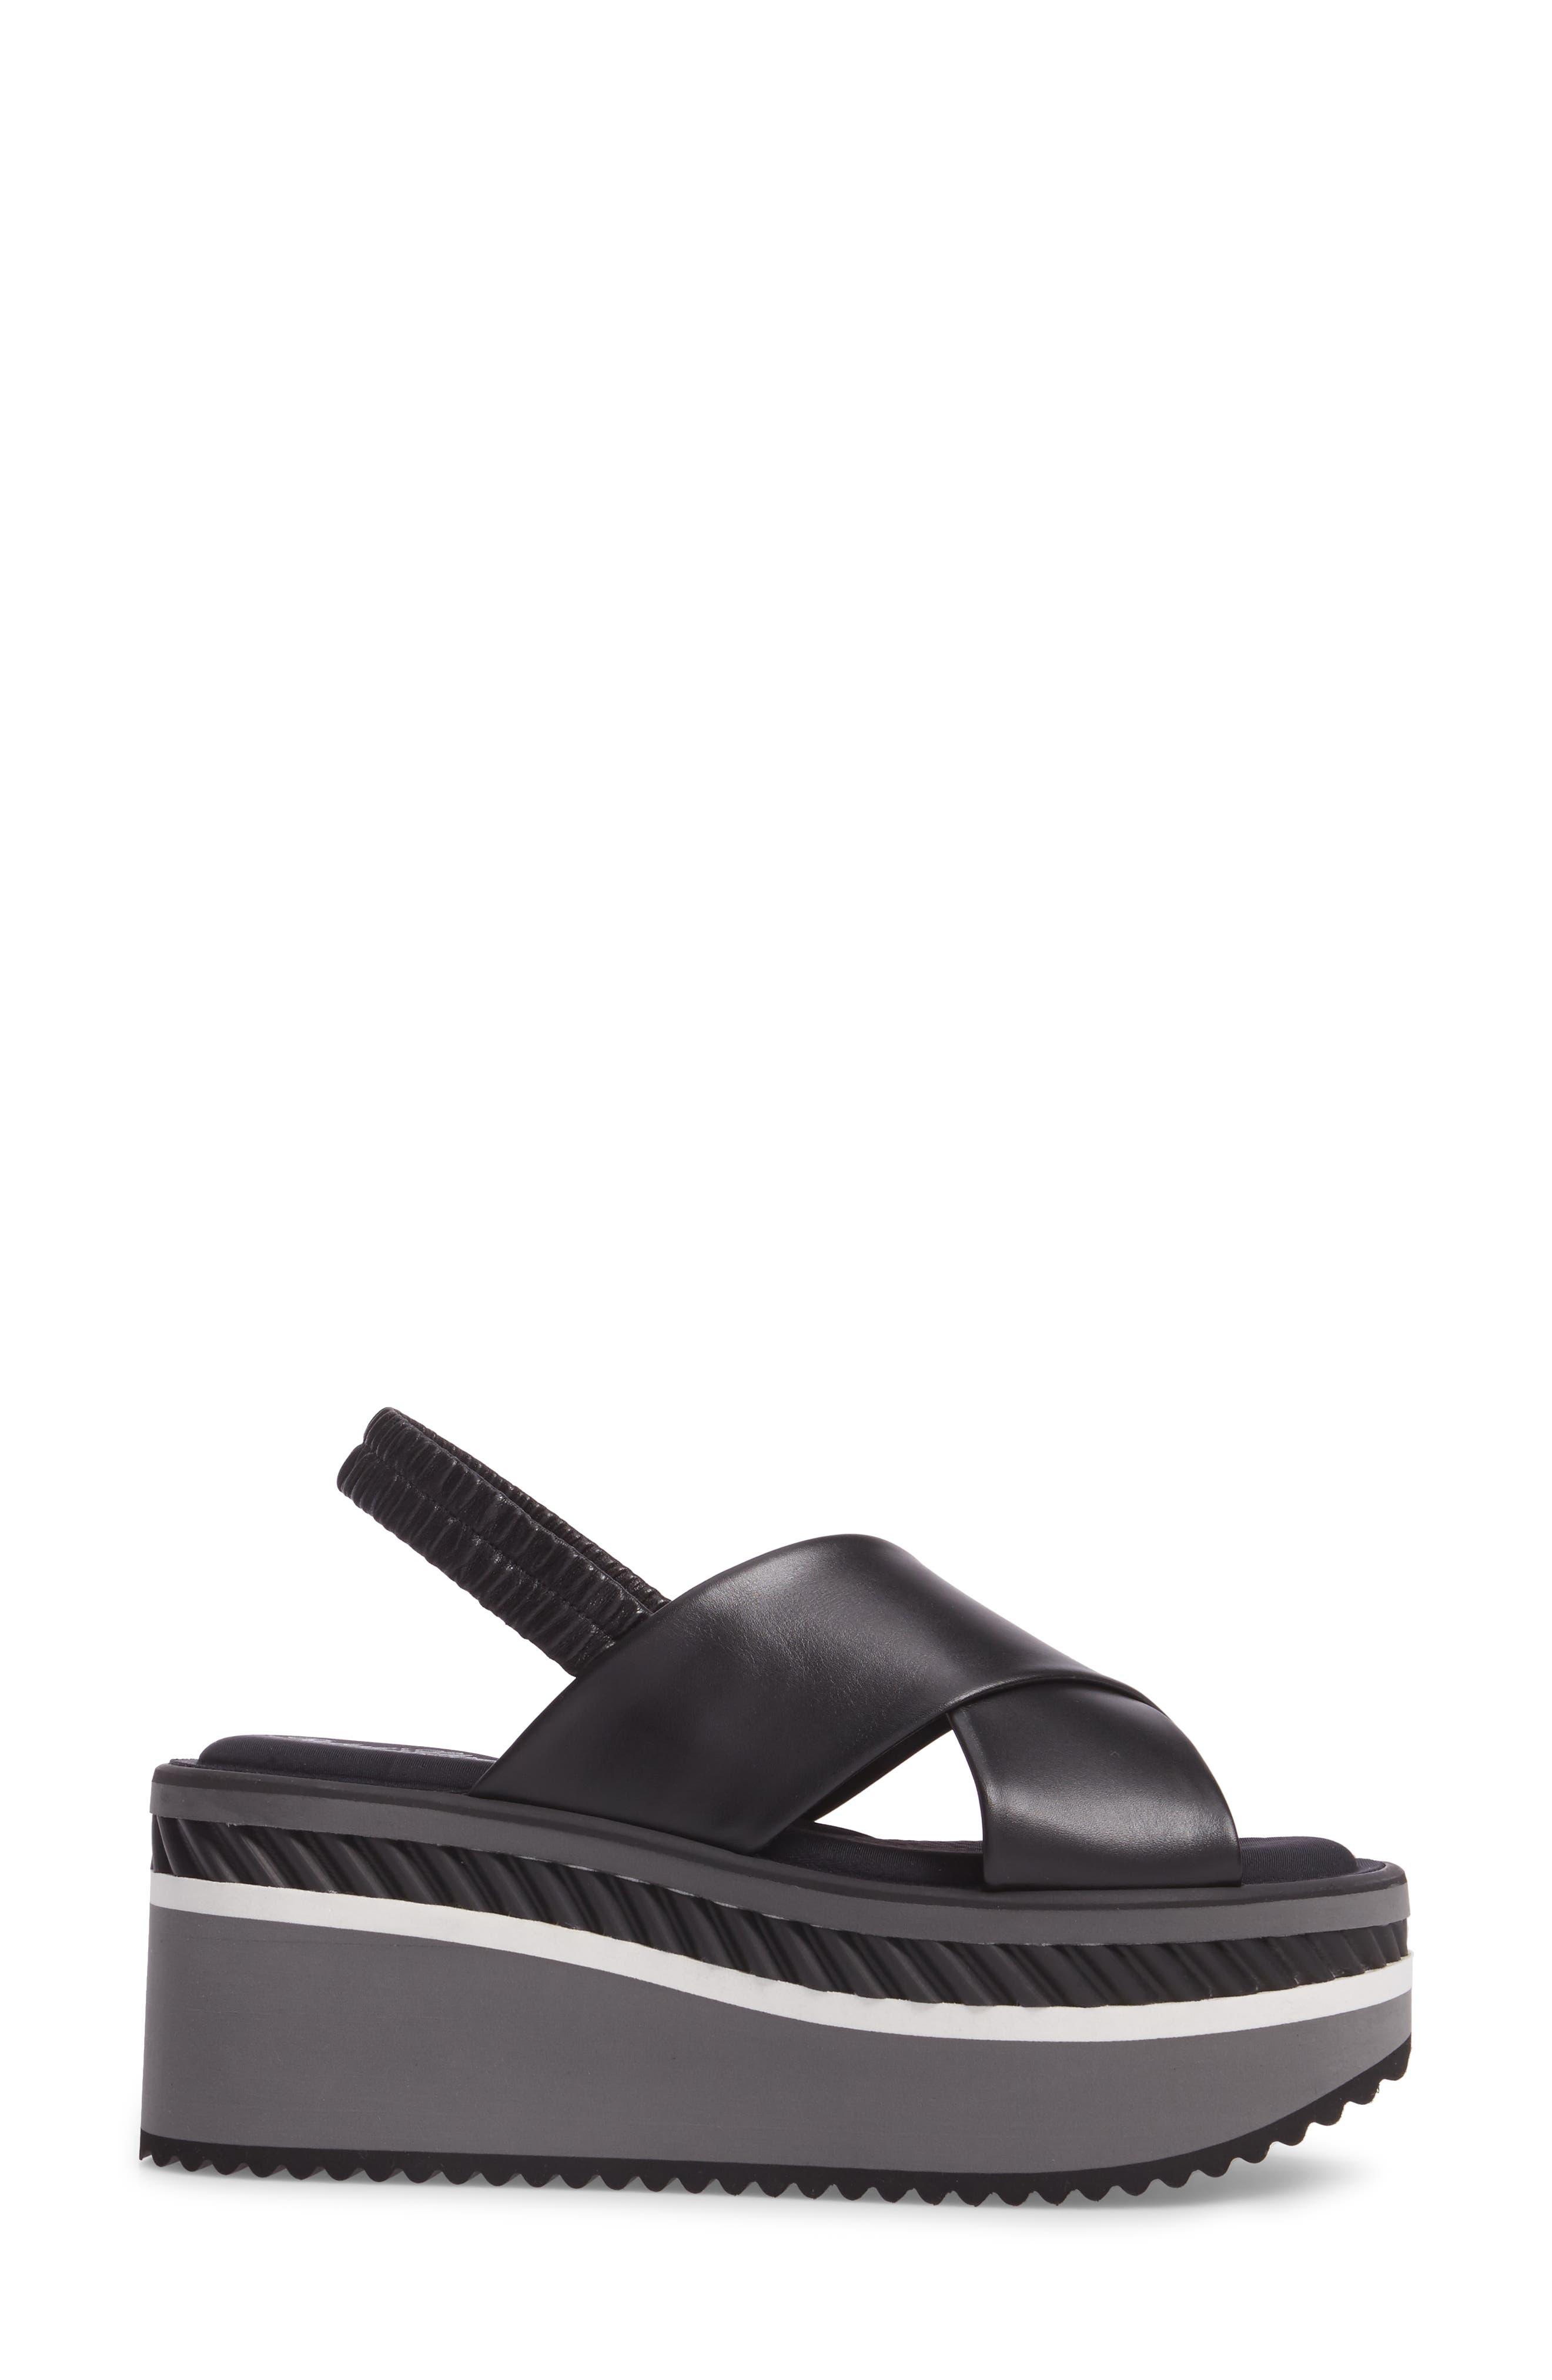 Omin Platform Slingback Sandal,                             Alternate thumbnail 3, color,                             001